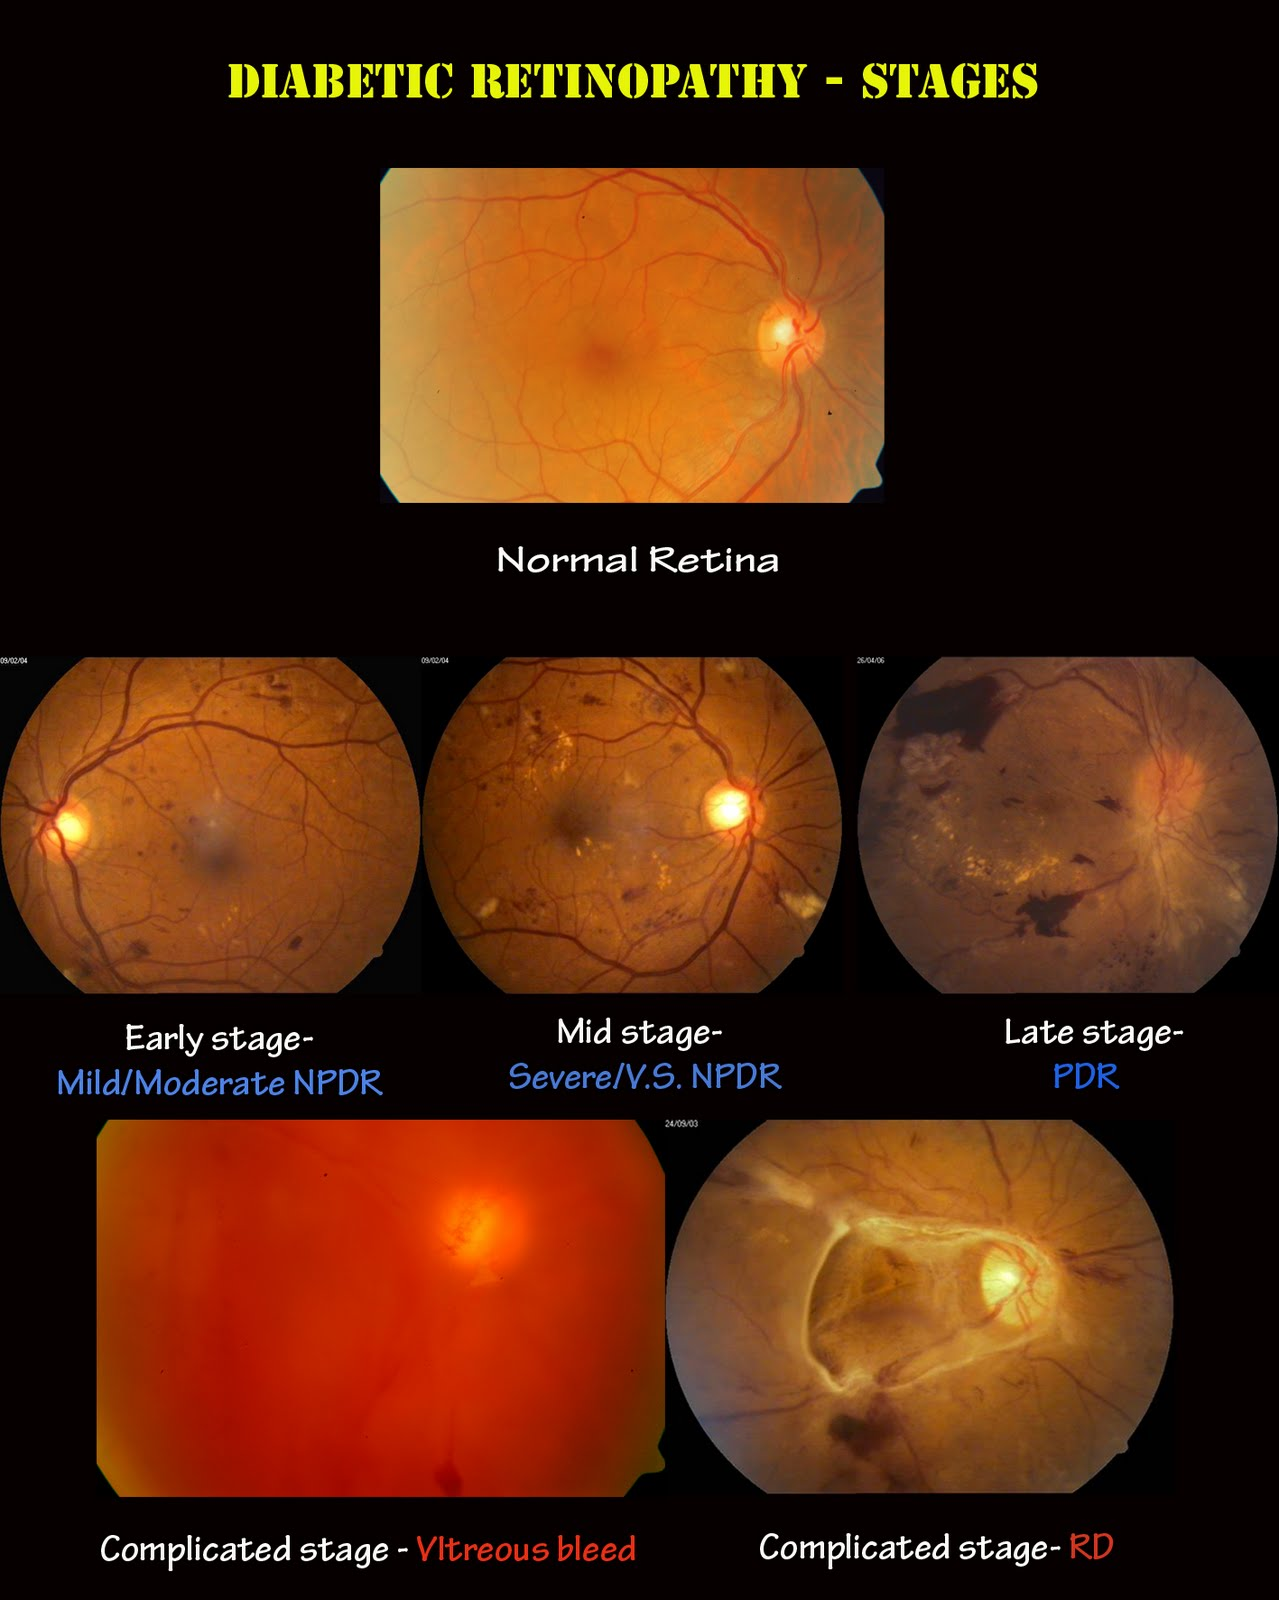 diabetic retinopathy, DIABETIC RETINOPATHY, Optometrist in Petaling Jaya   Optical Shop